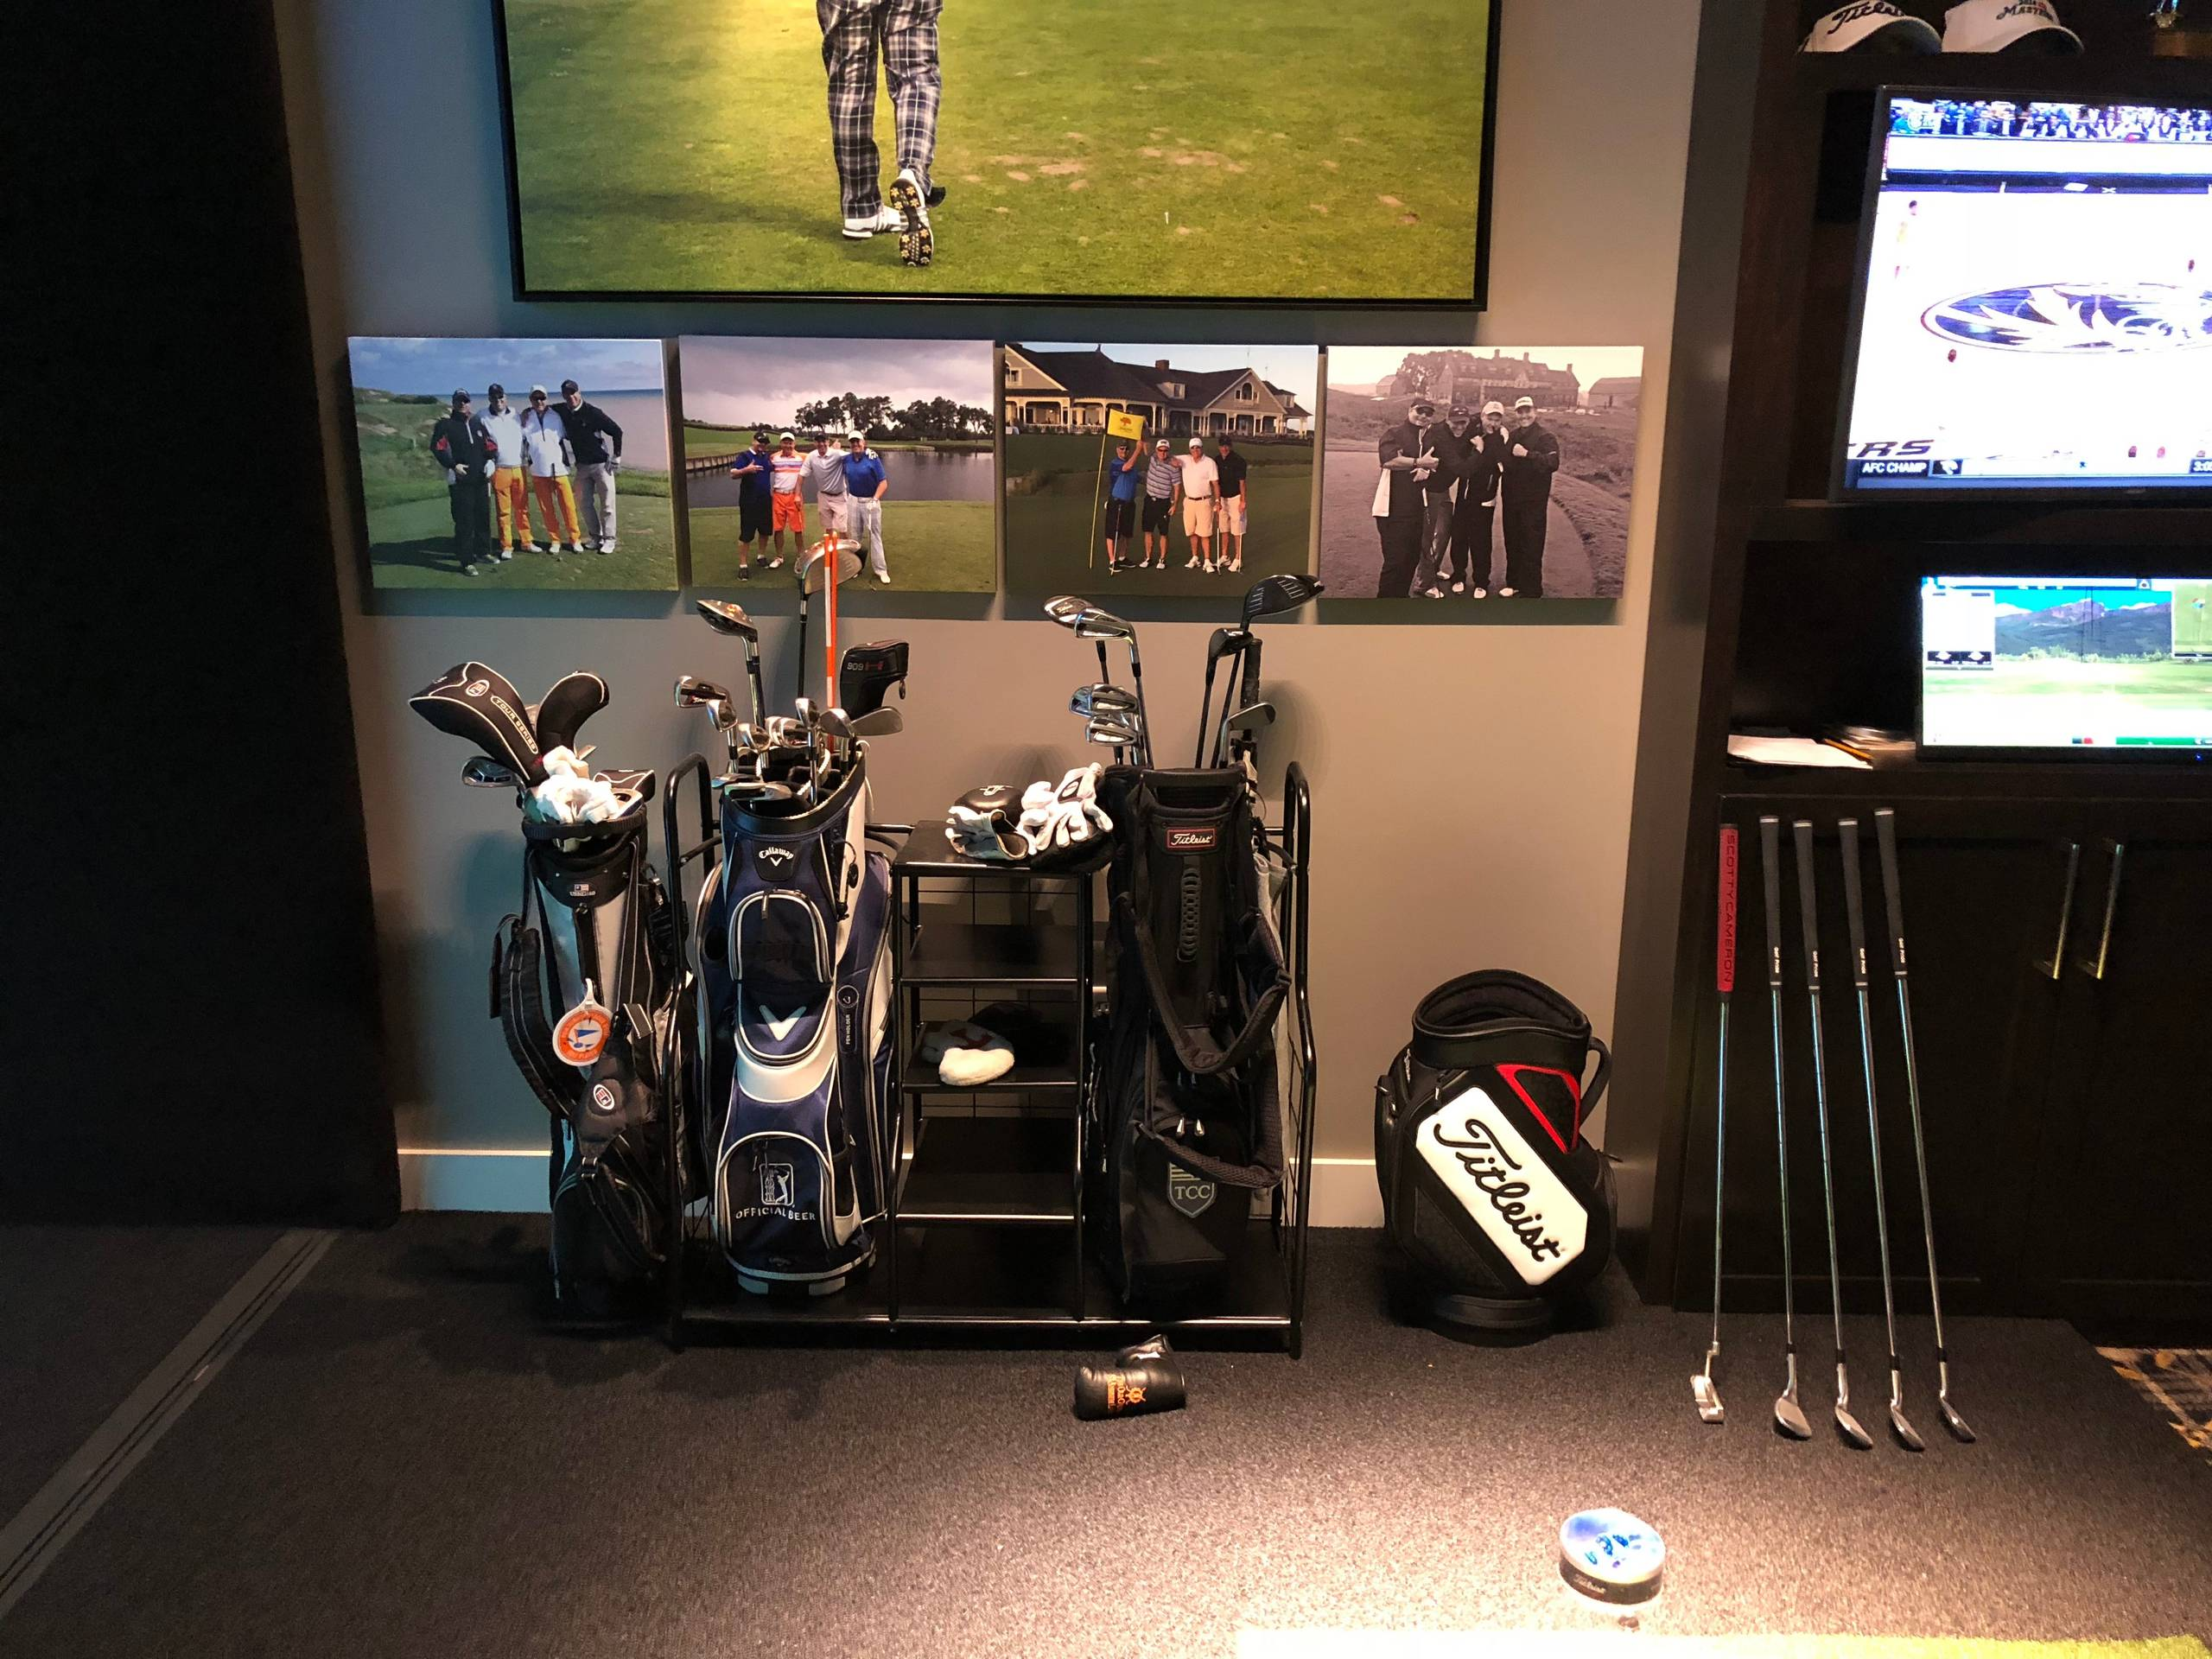 Golf simulation room - garage conversion